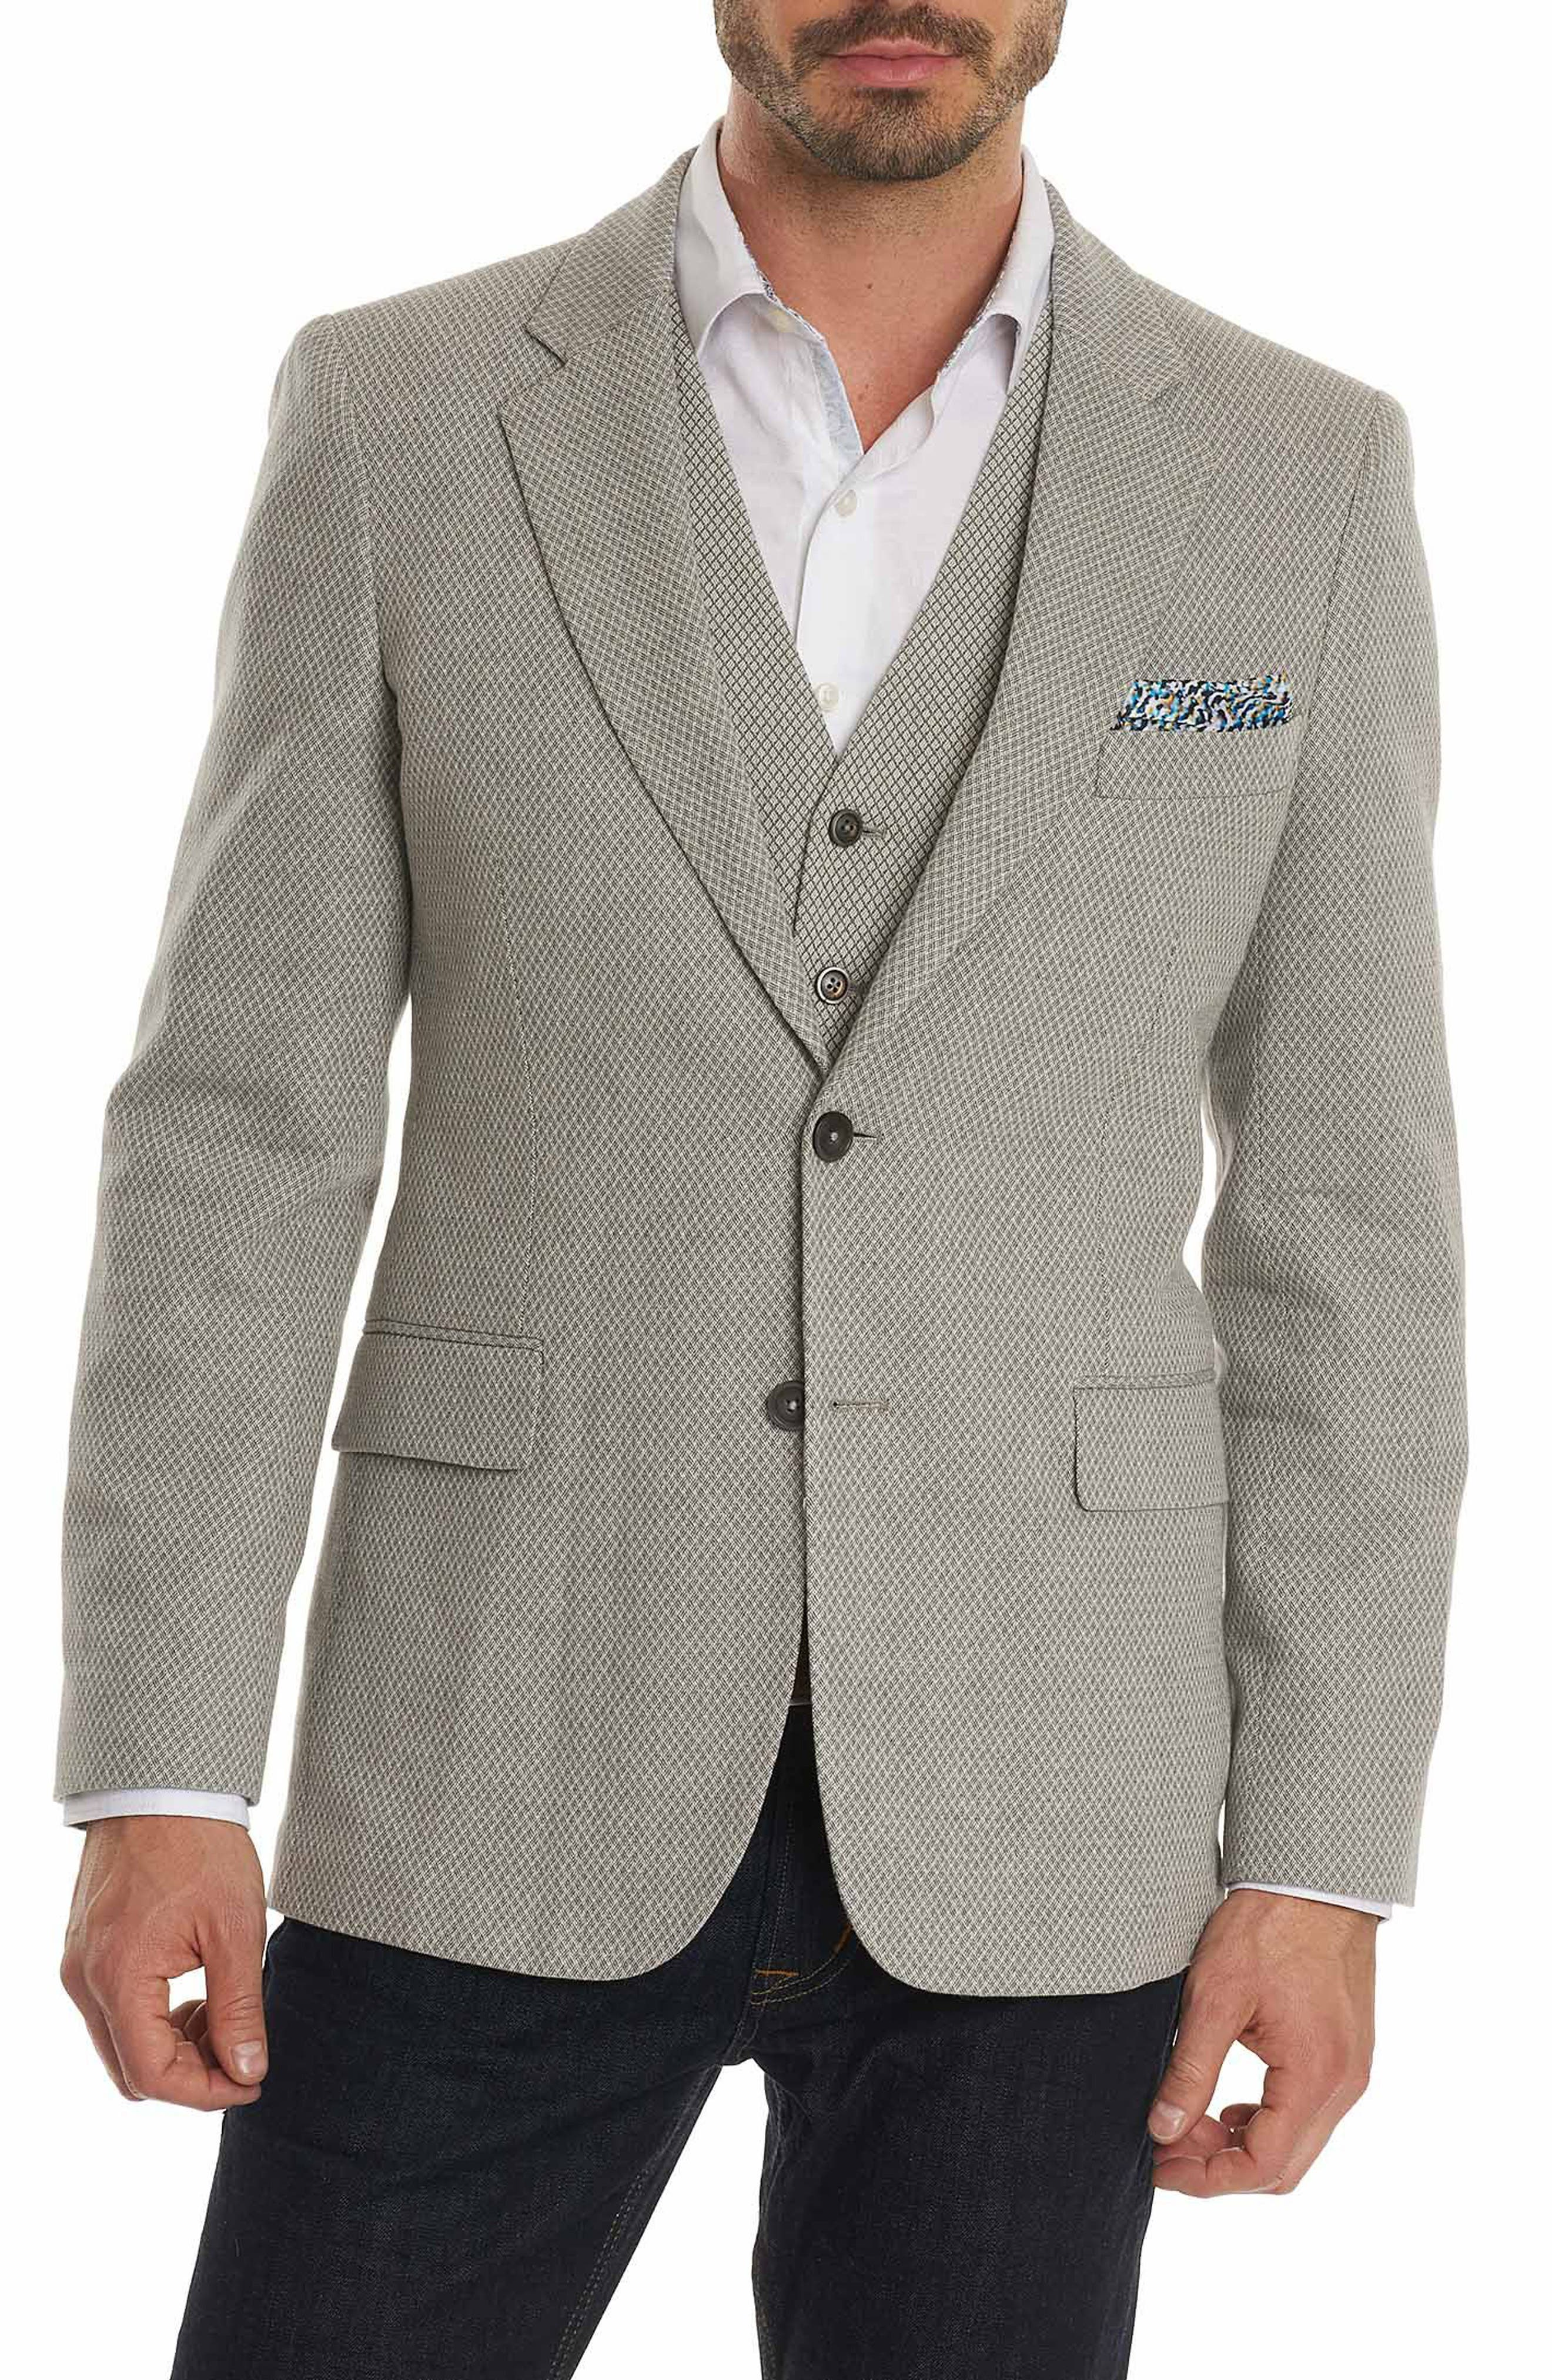 Main Image - Robert Graham Marty Cotton & Linen Sport Coat